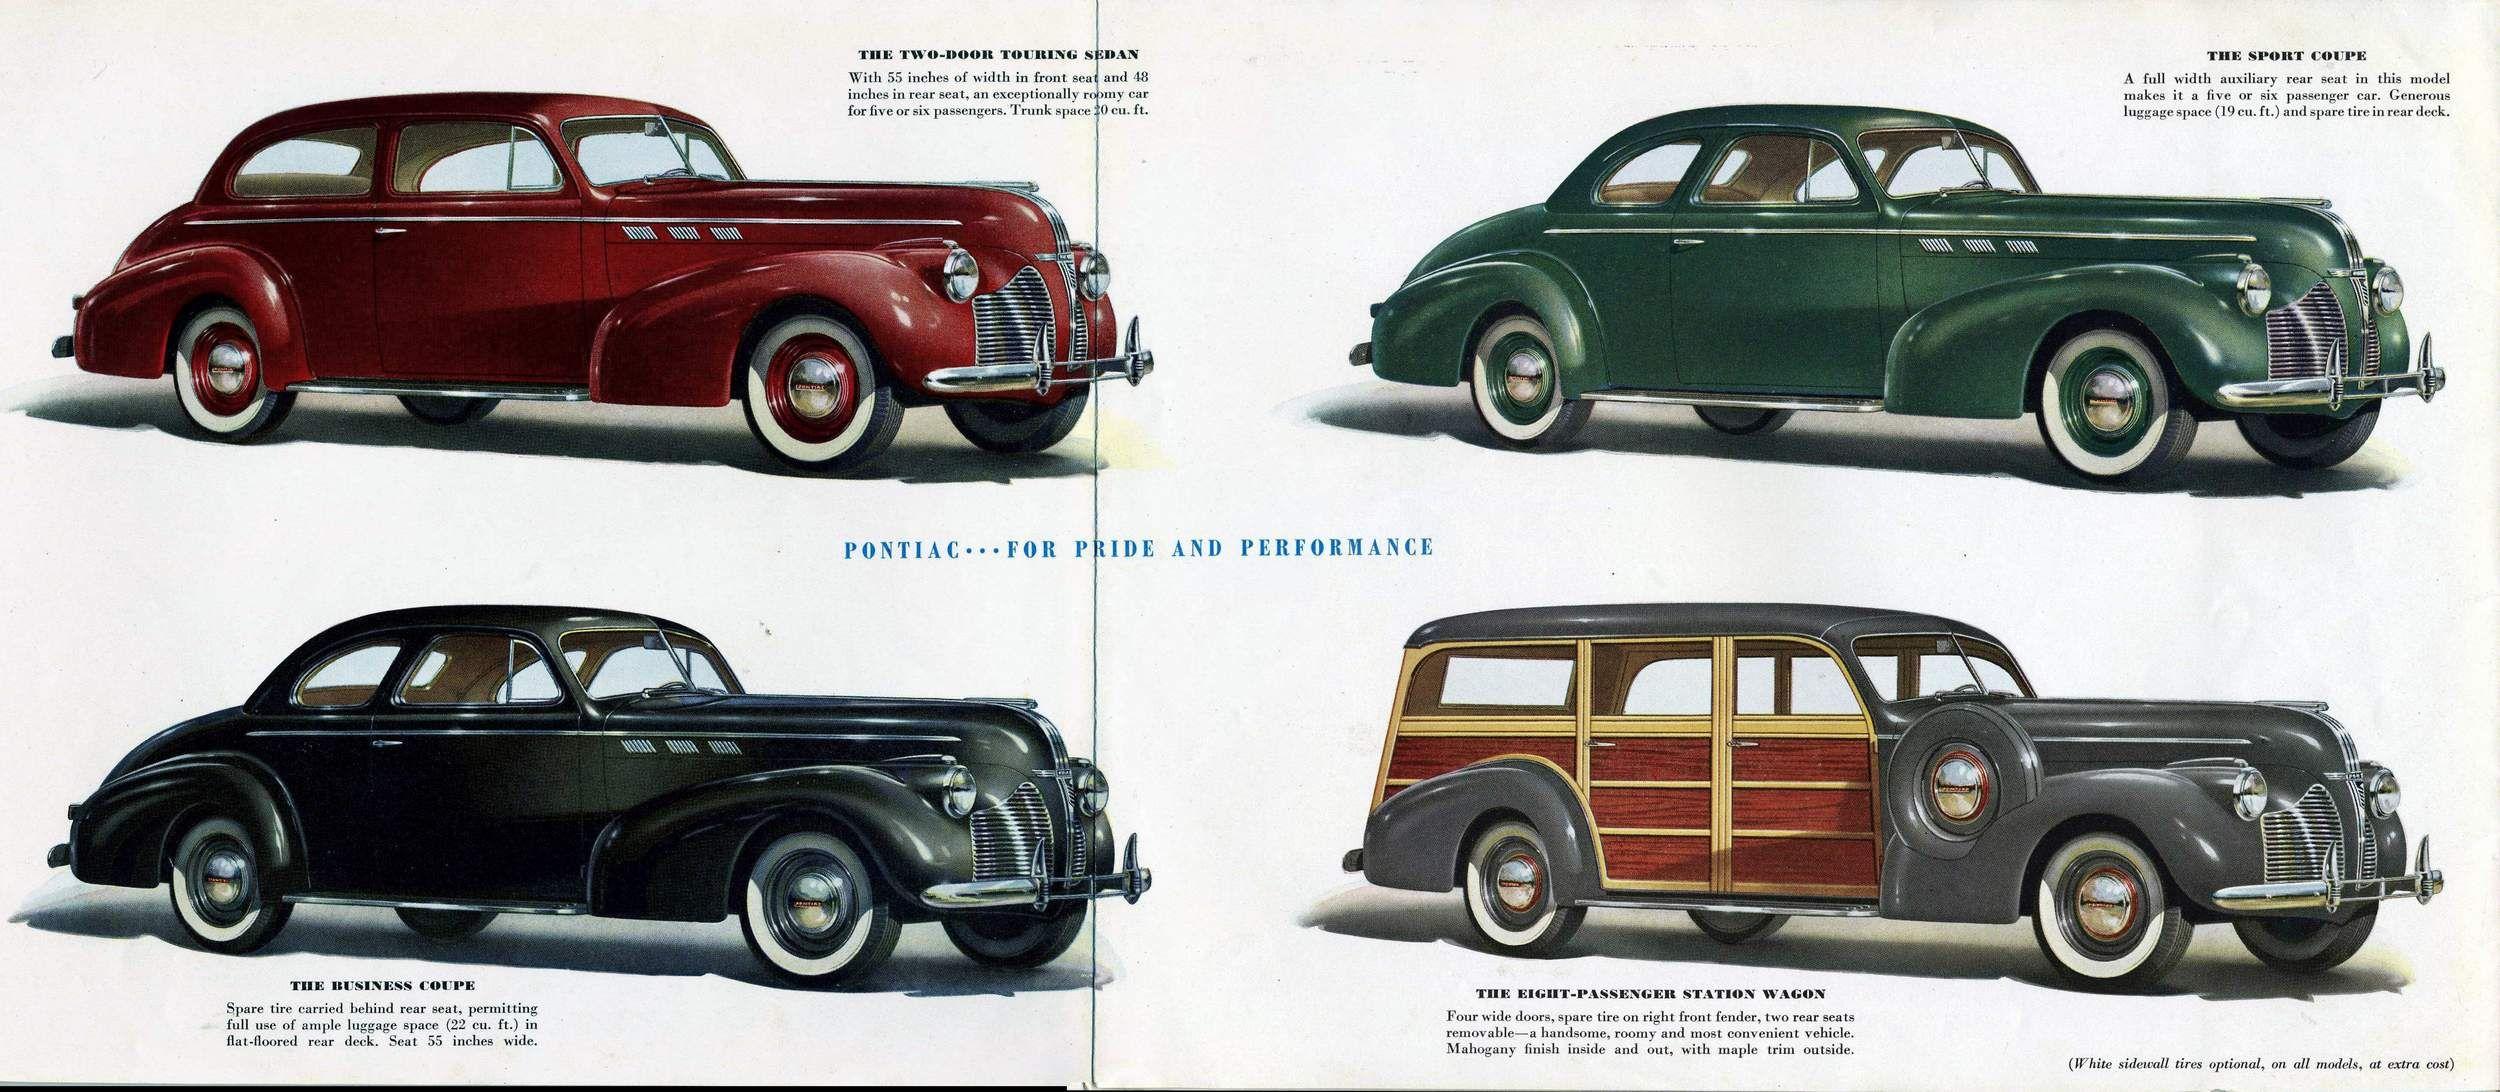 1940 pontiac special six two door touring sedan business for 1940 pontiac 2 door sedan